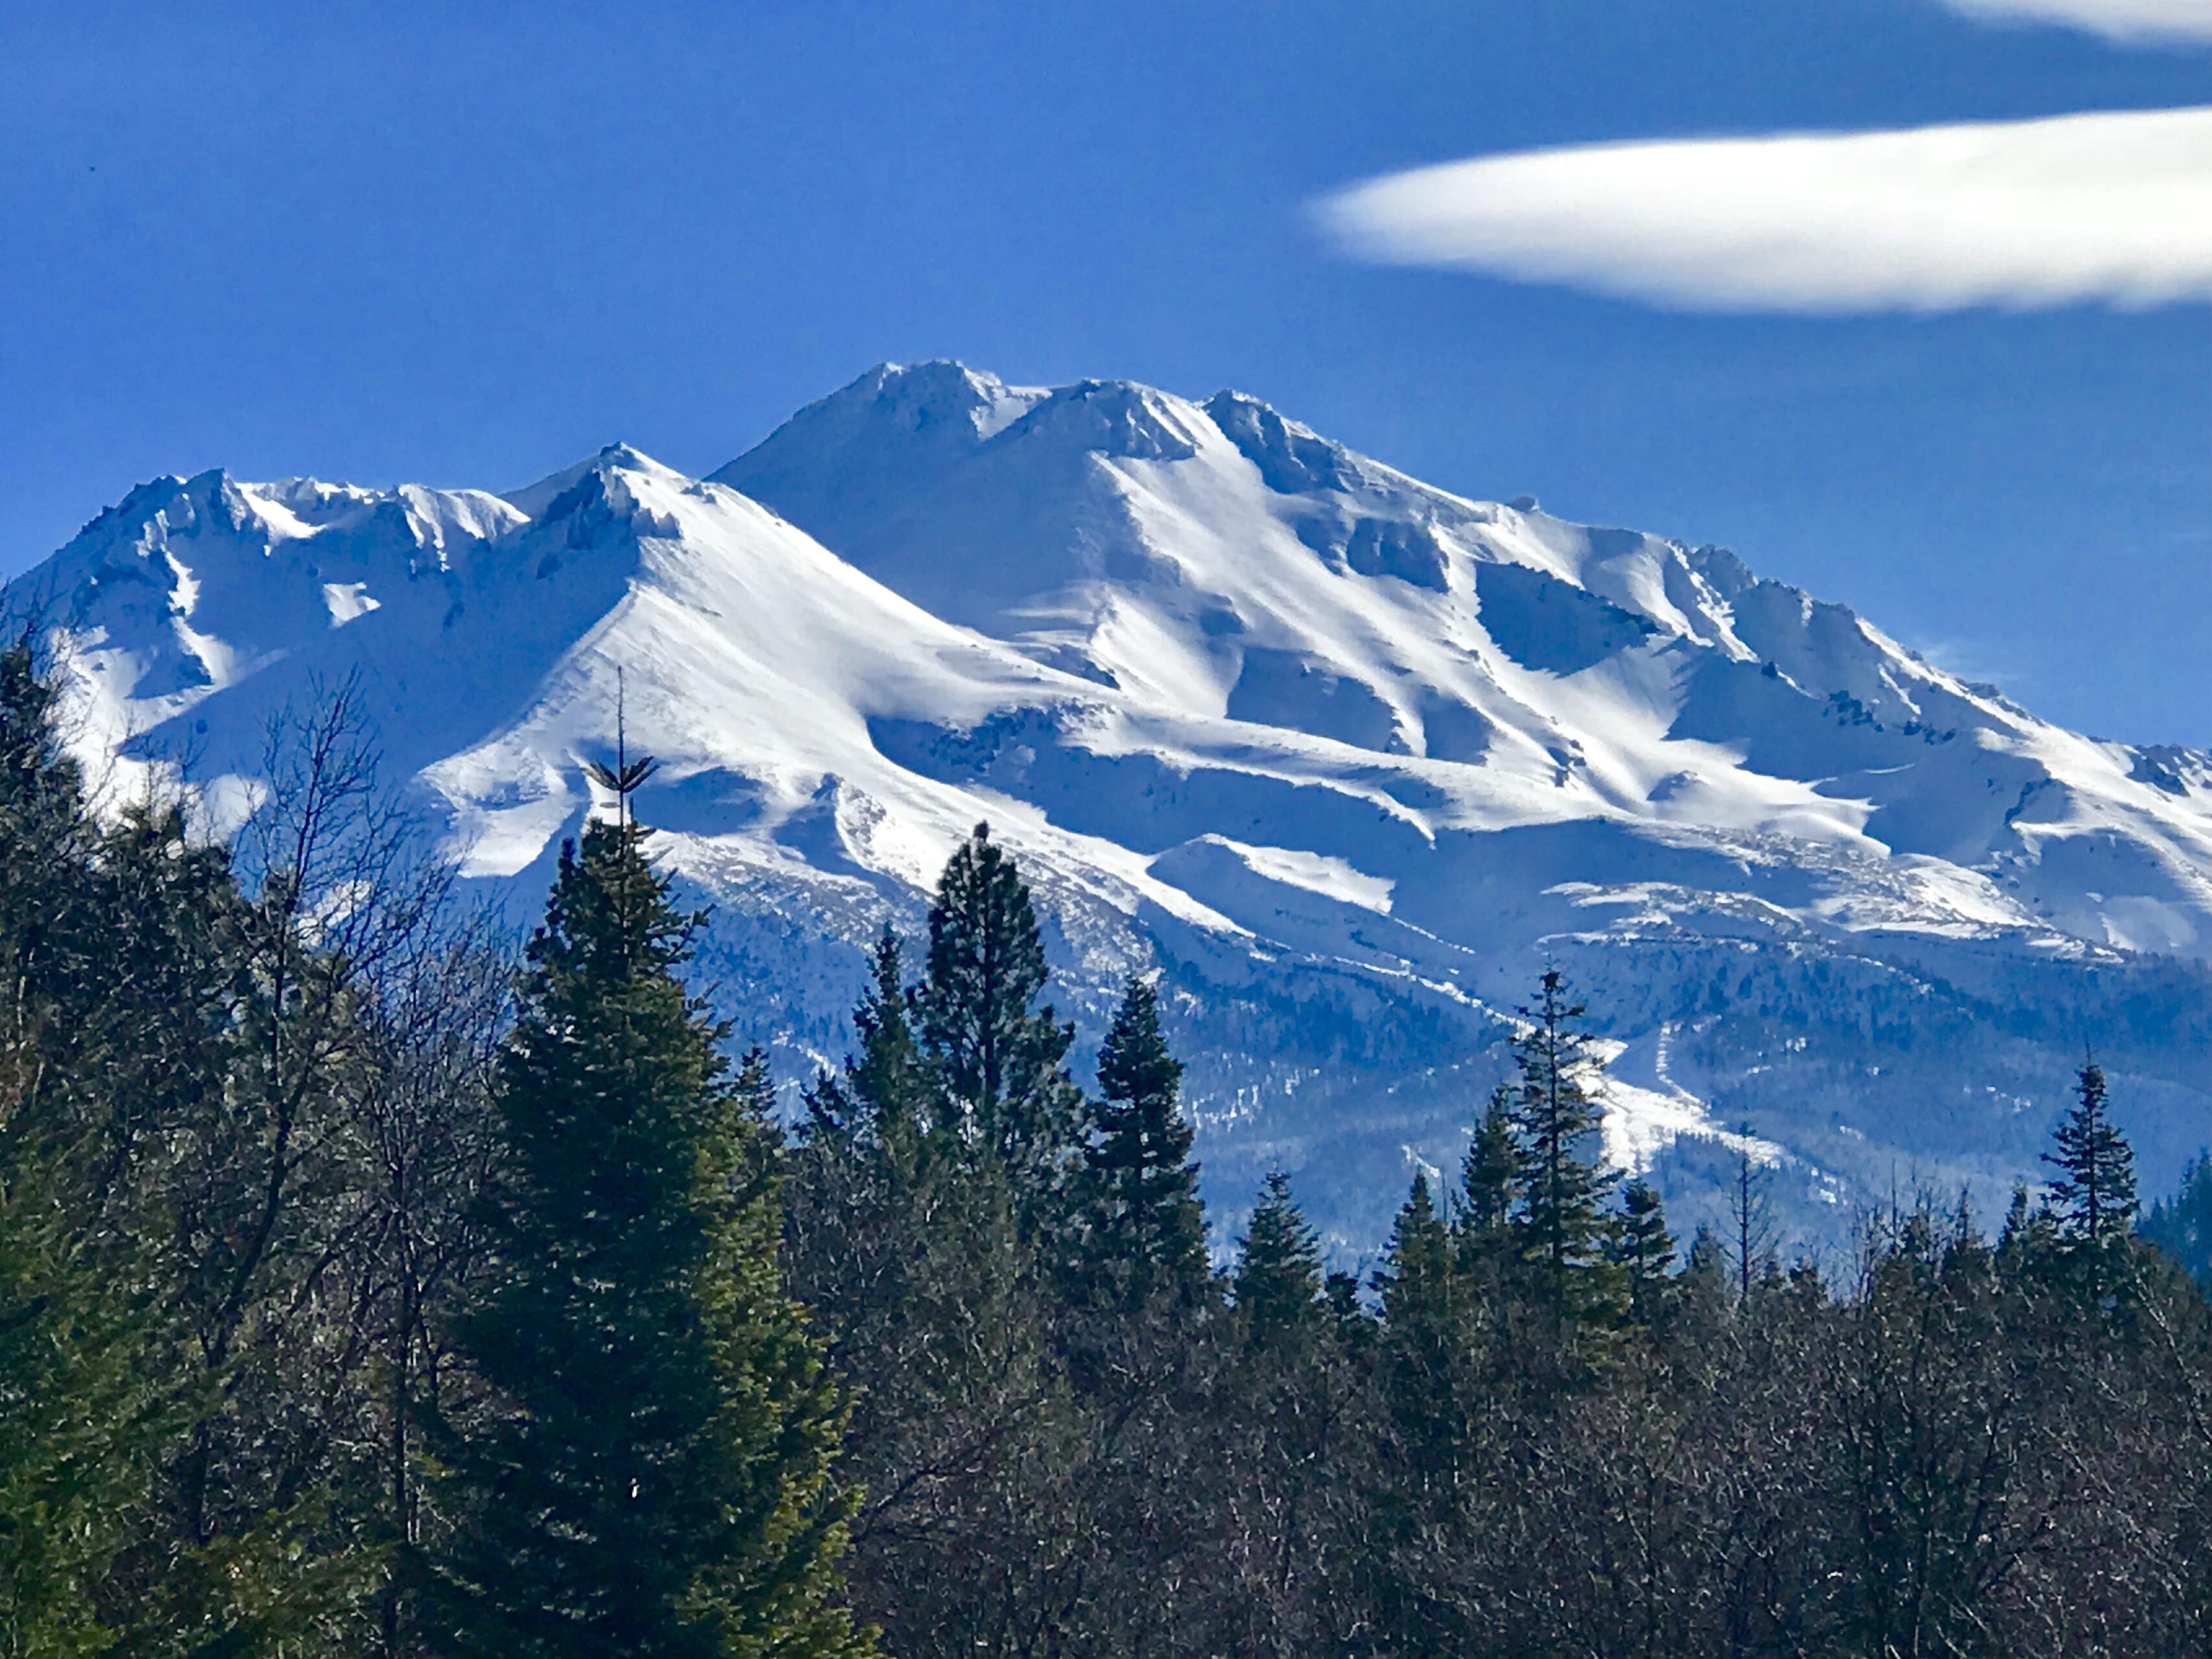 Mount Shasta viewed from the Sanctua